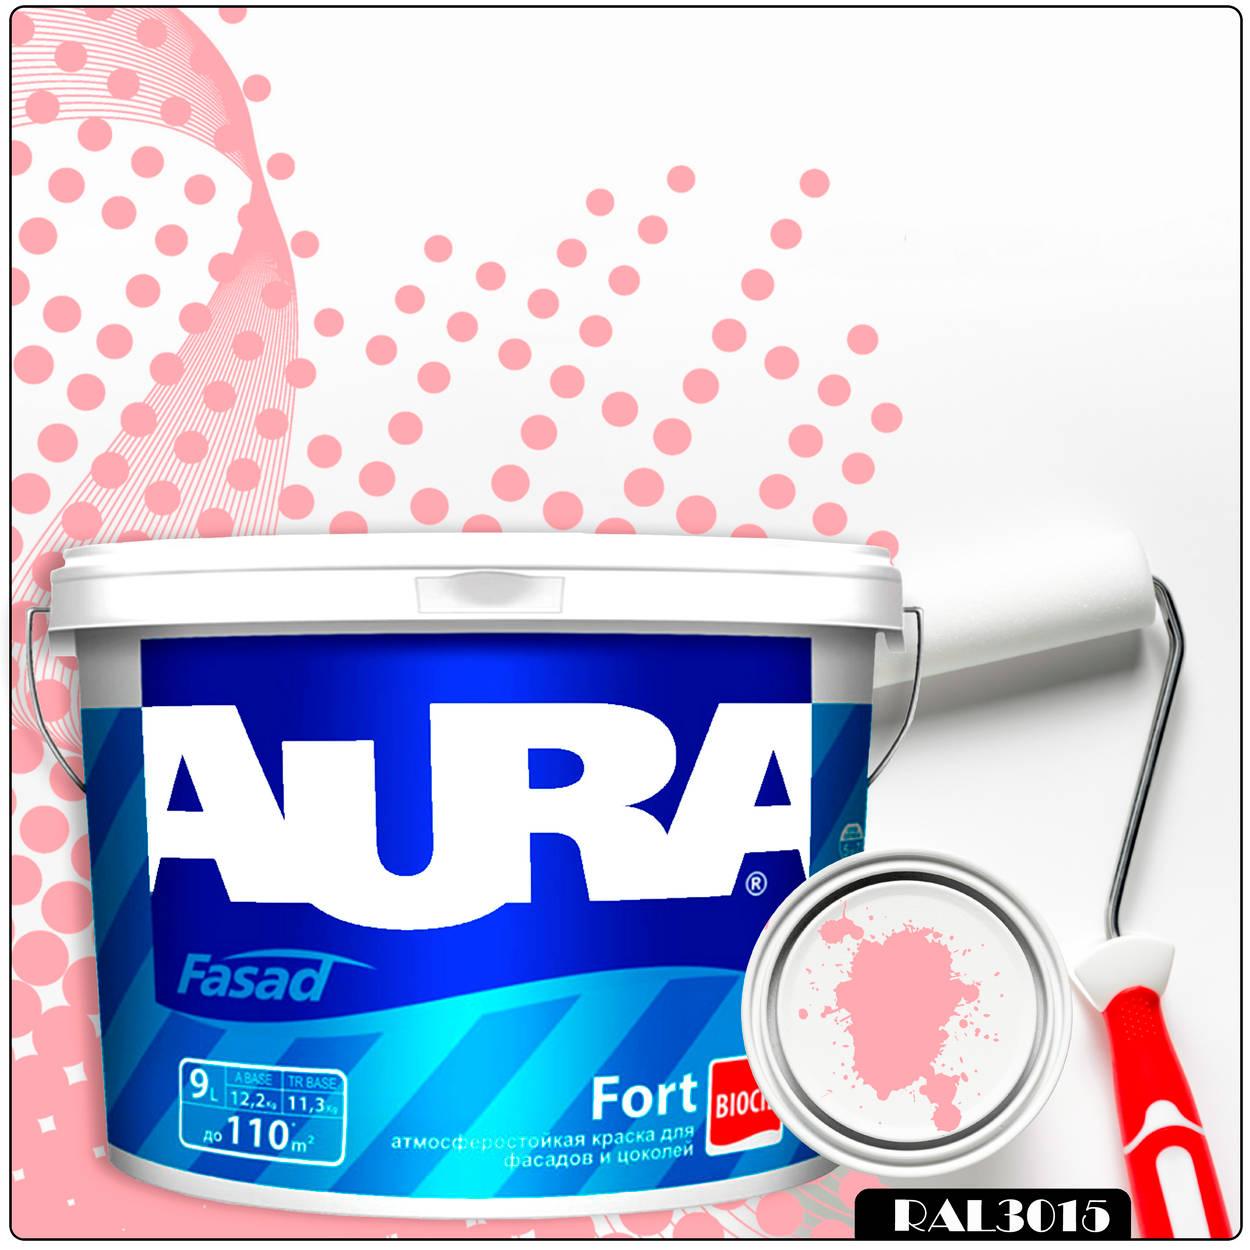 Фото 13 - Краска Aura Fasad Fort, RAL 3015 Светло-розовый, латексная, матовая, для фасада и цоколей, 9л, Аура.